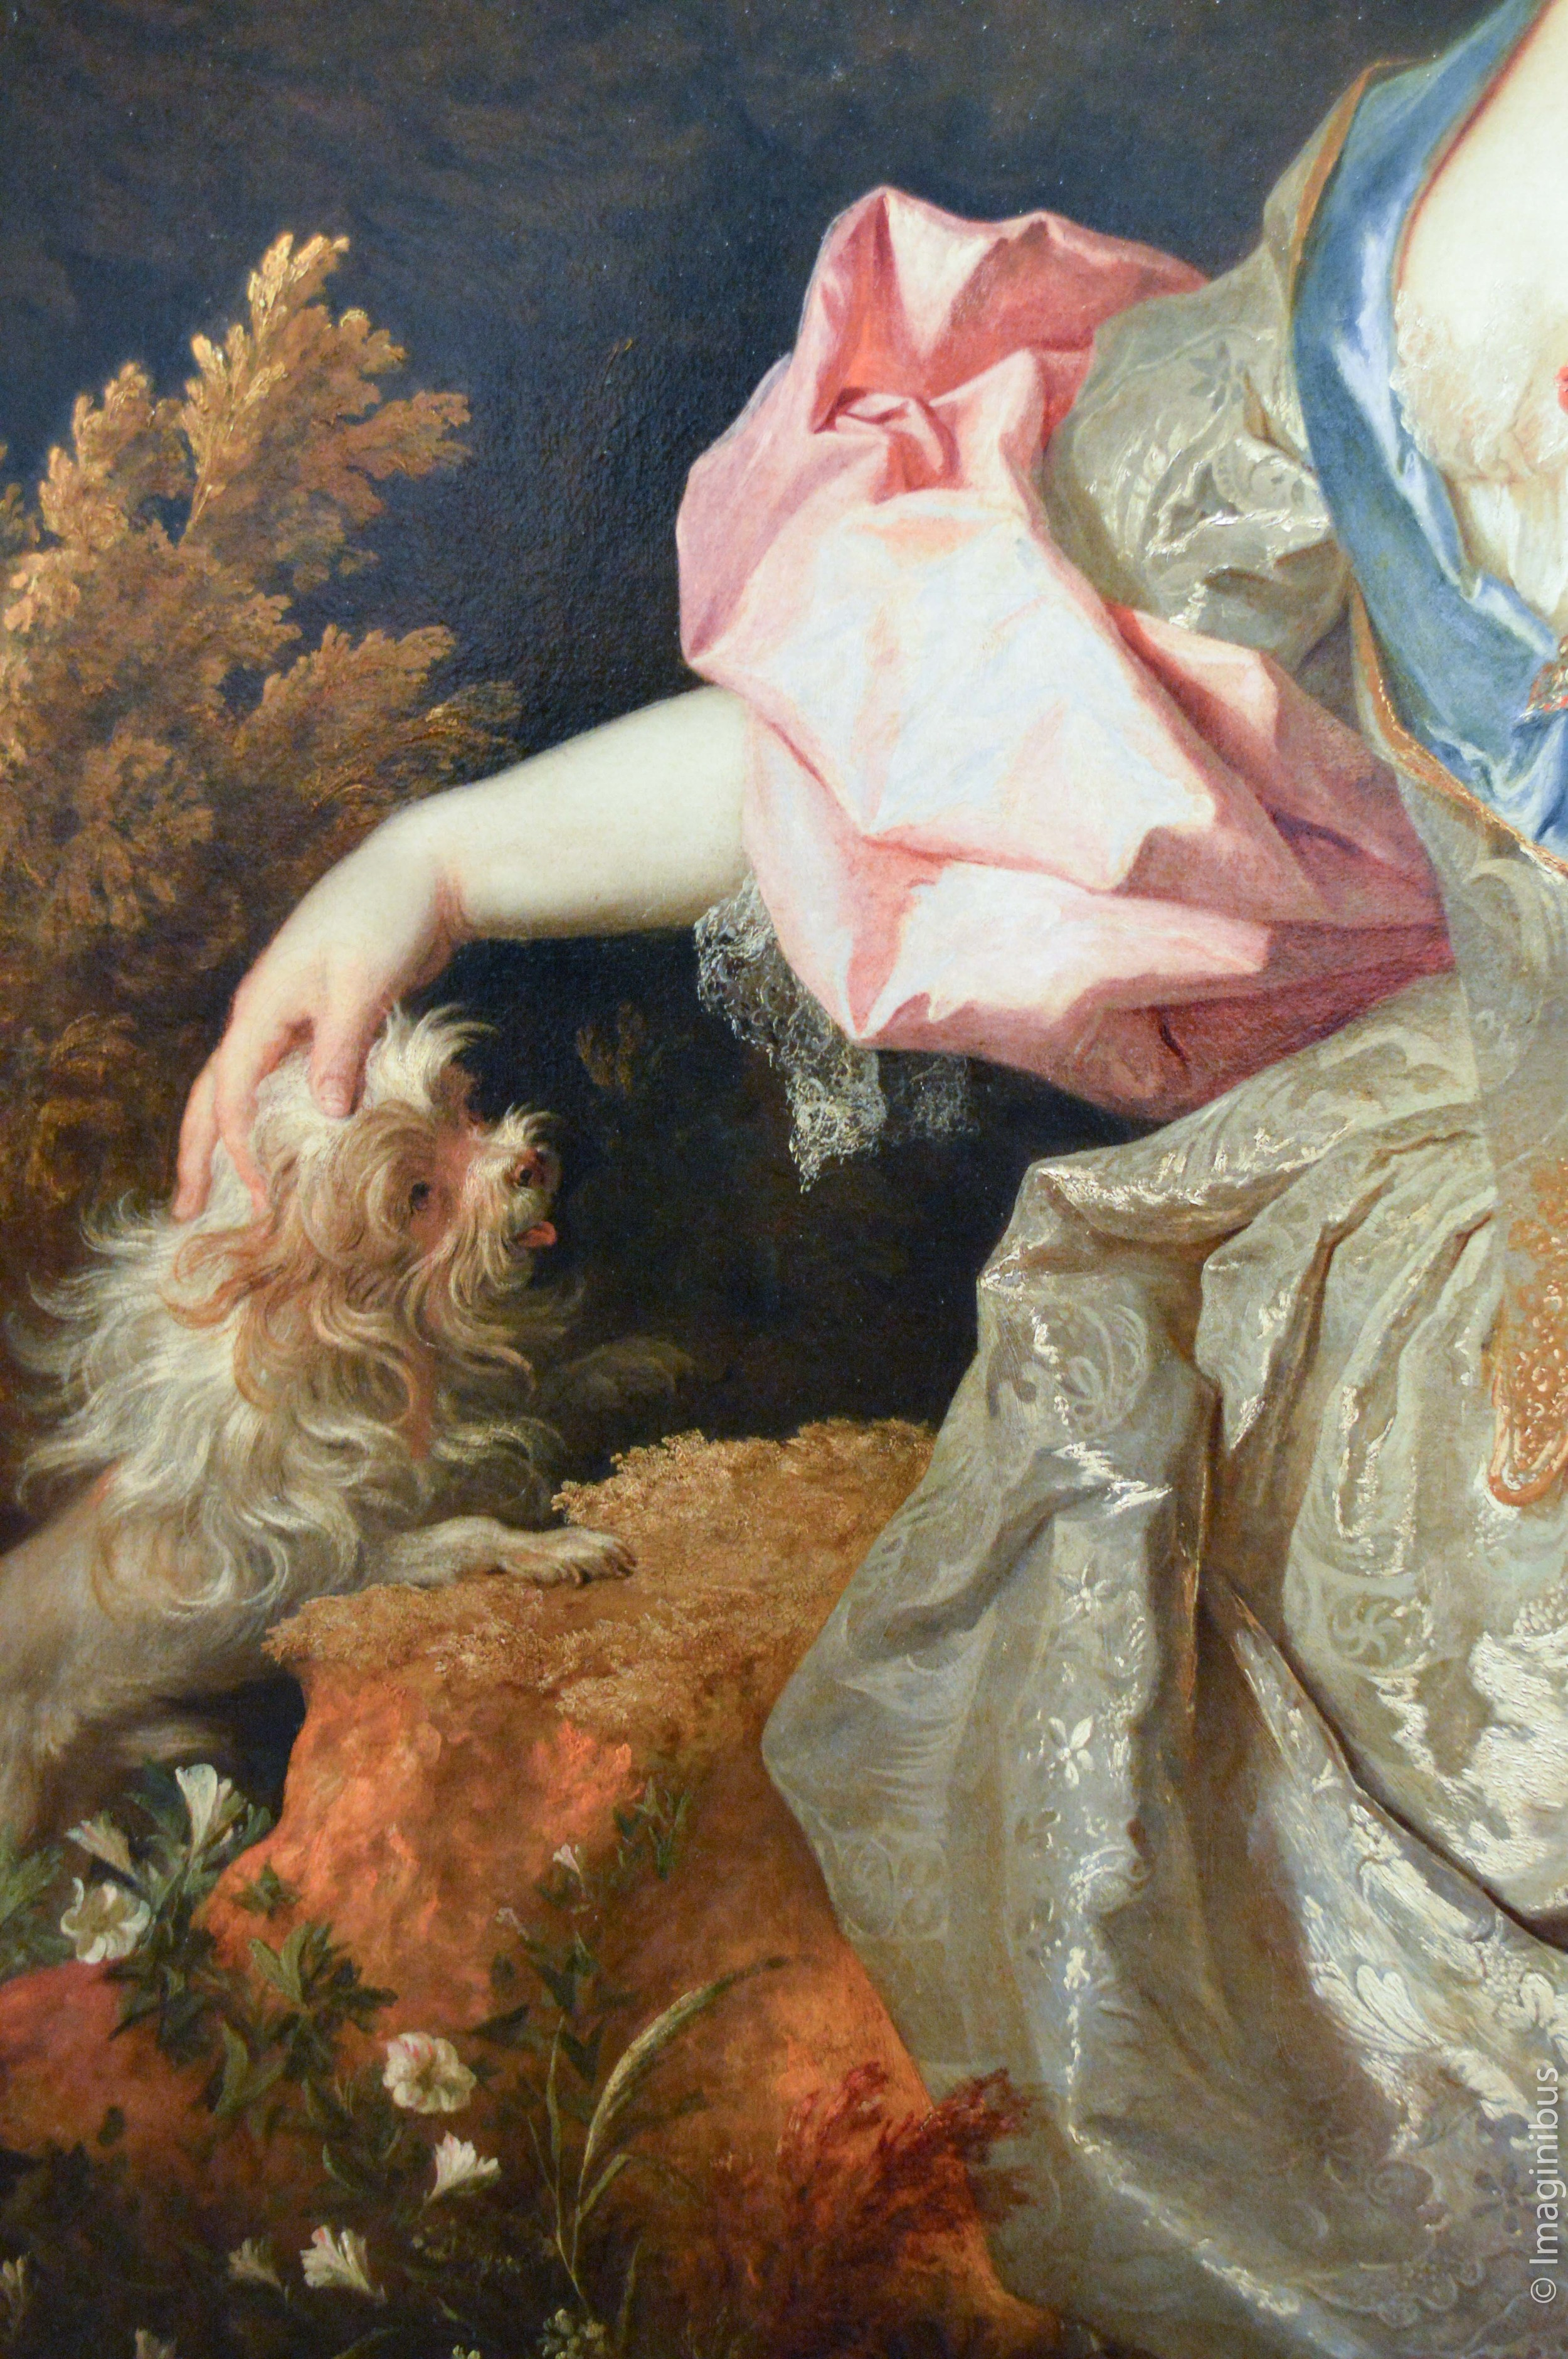 Montreal Museum of Fine Arts, Nicolas de Largillierre, Portrait of a Woman as Astrea, Probably Mary Josephine Drummond